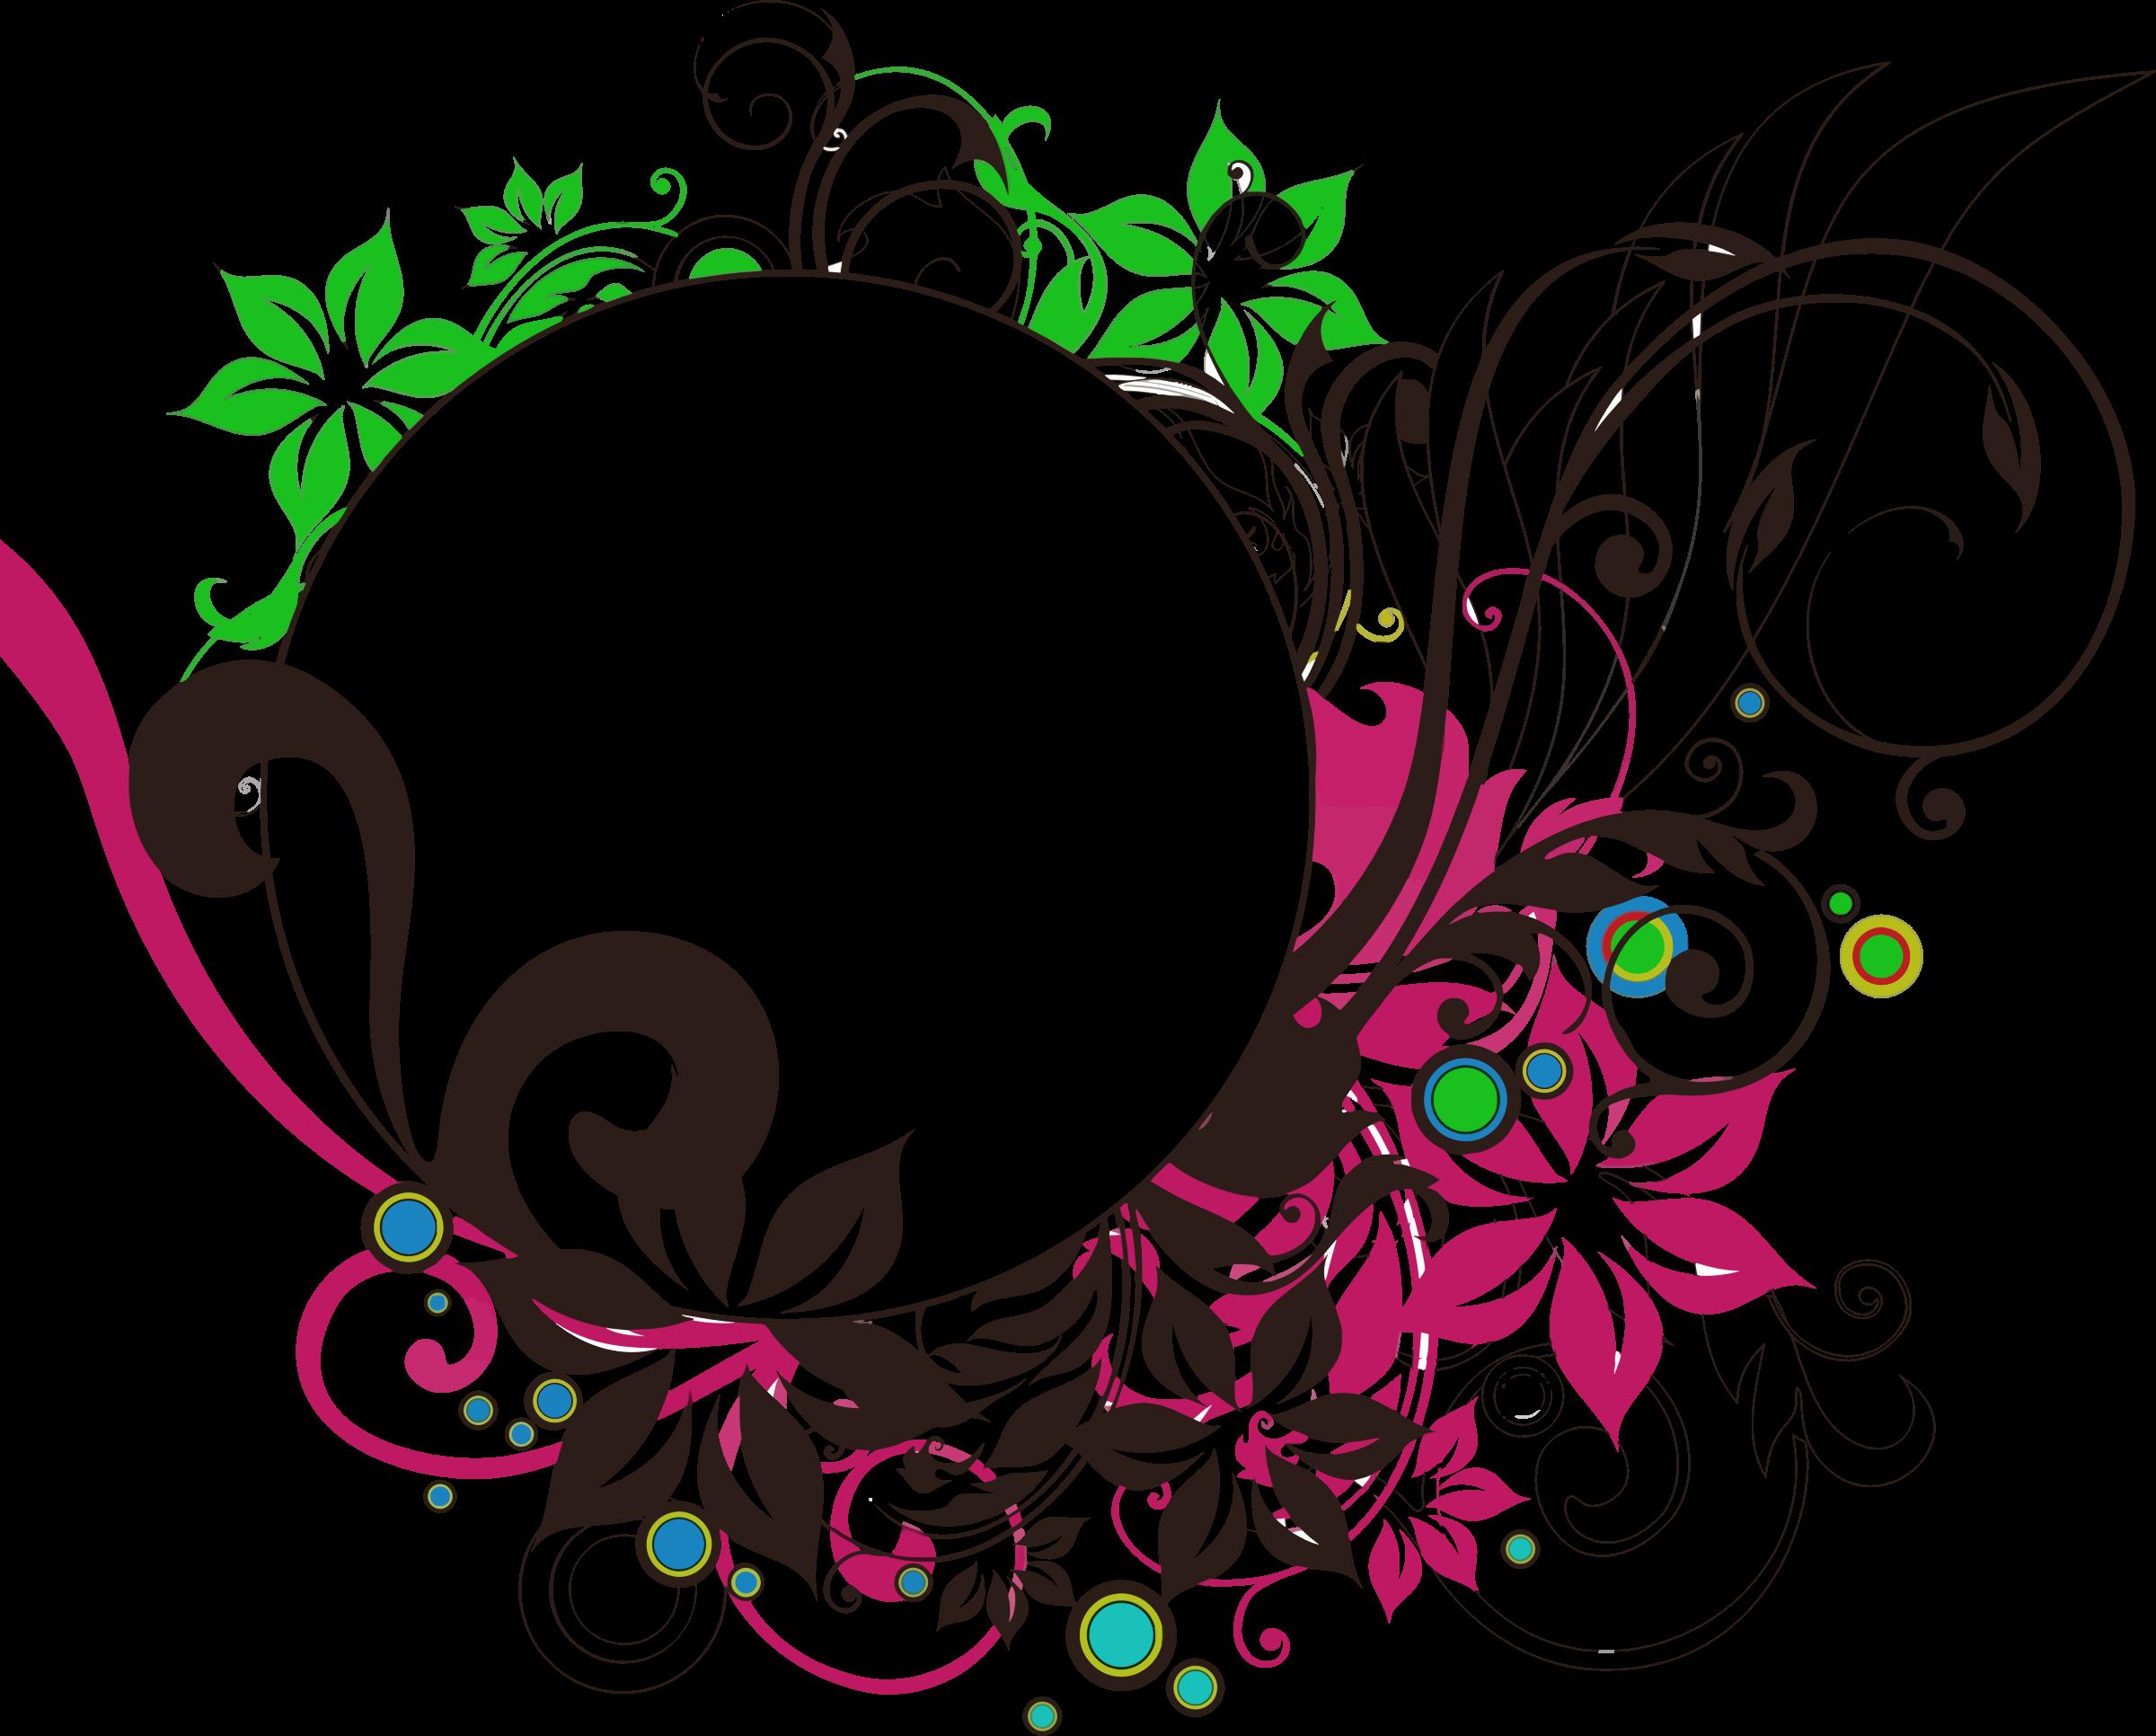 Download Floral Round Frame Photo HQ PNG Image   FreePNGImg